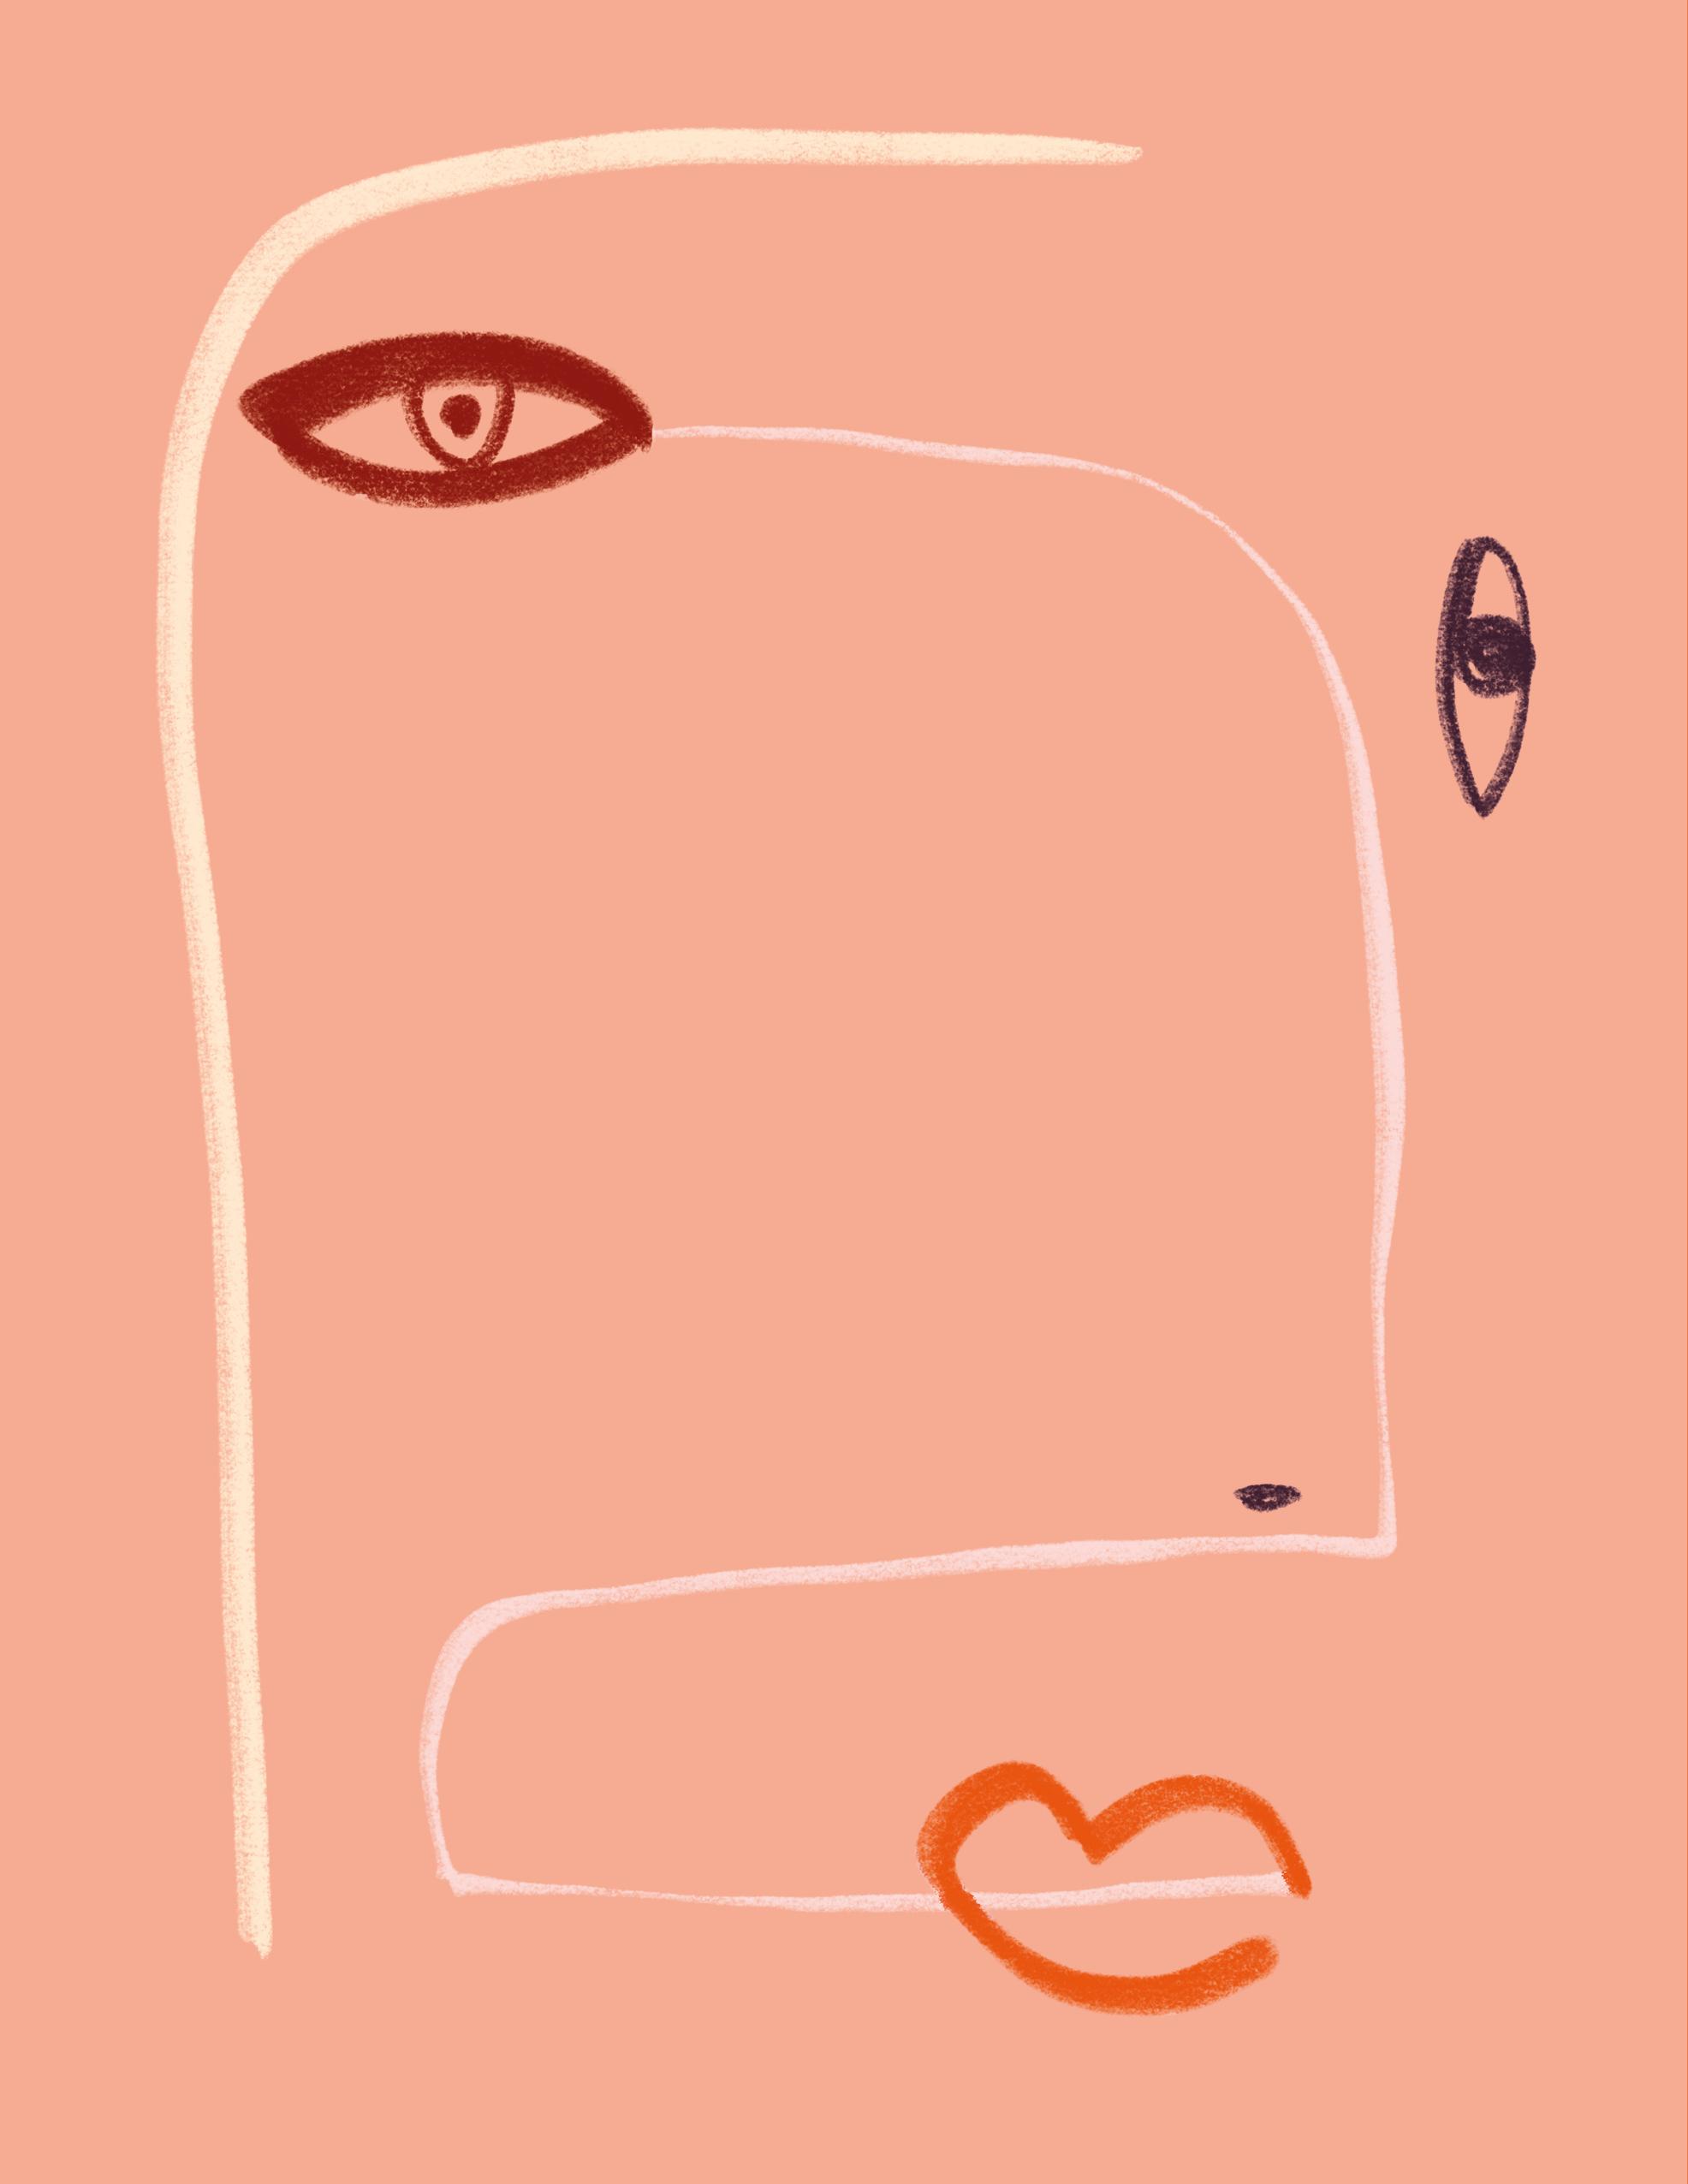 Face Values book by Navaz Batliwalla- back cover illustrated by Shira Barzilay